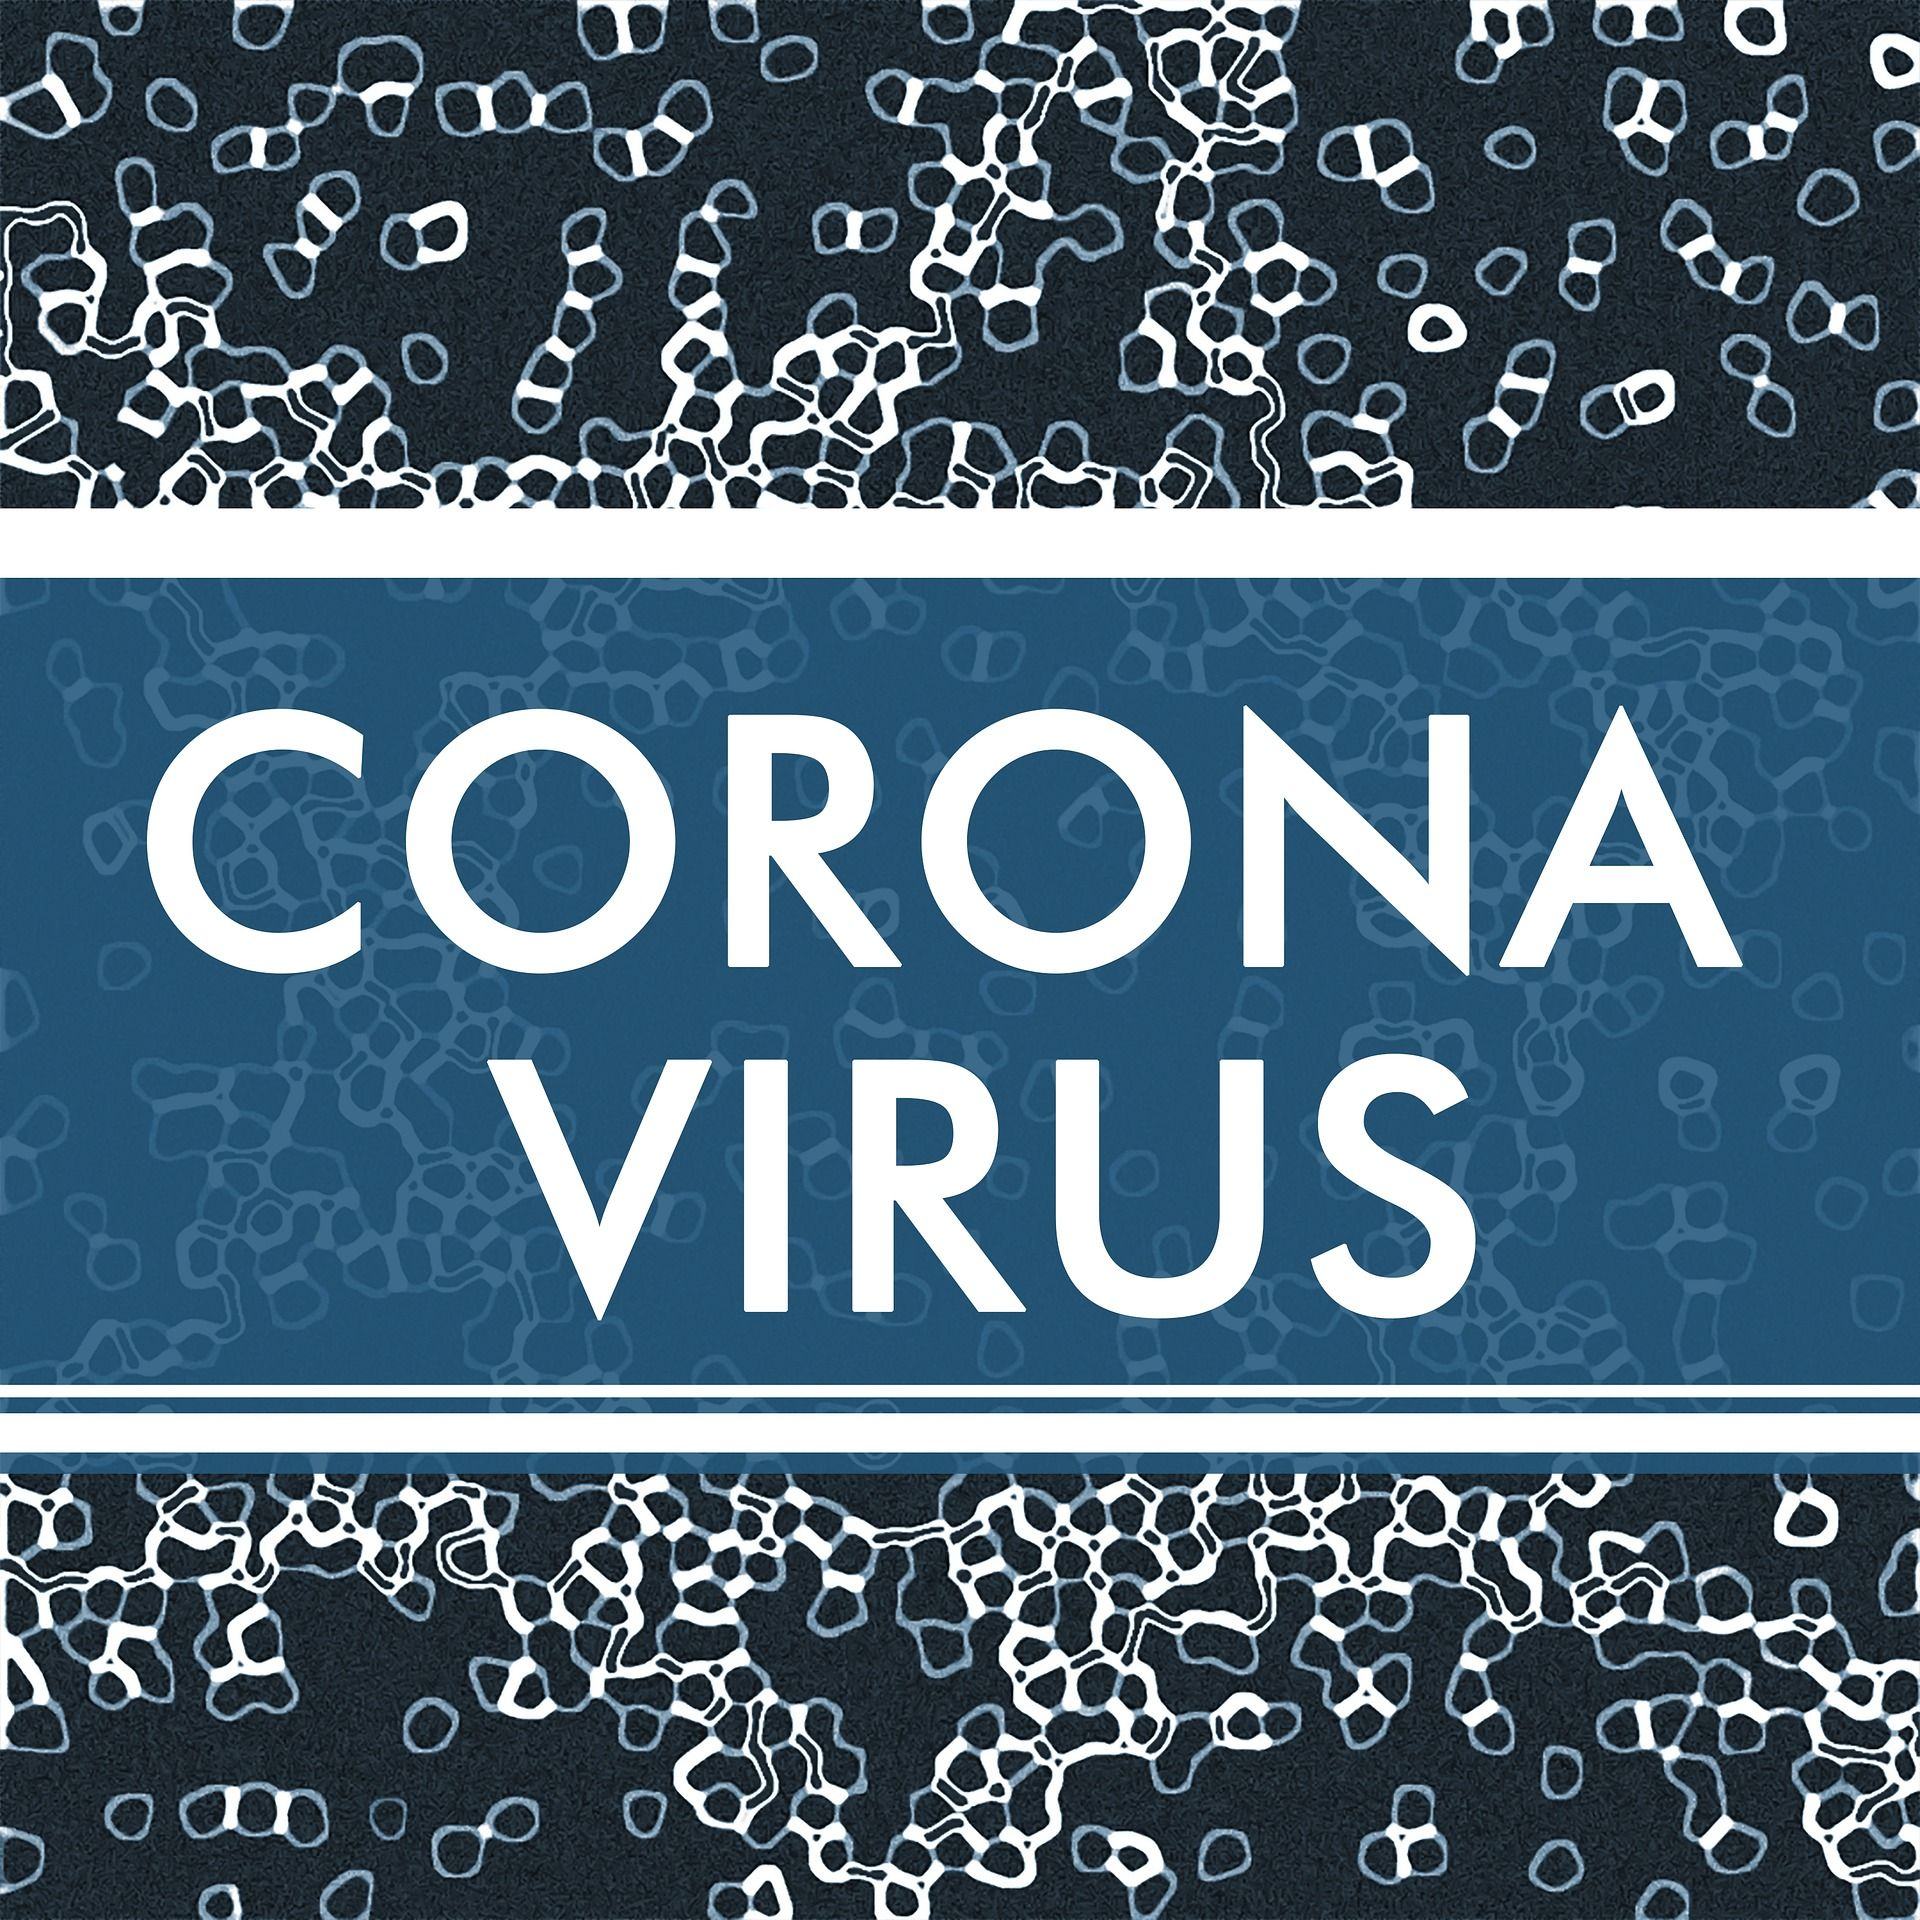 coronavirus sintomas tratamiento que se viene